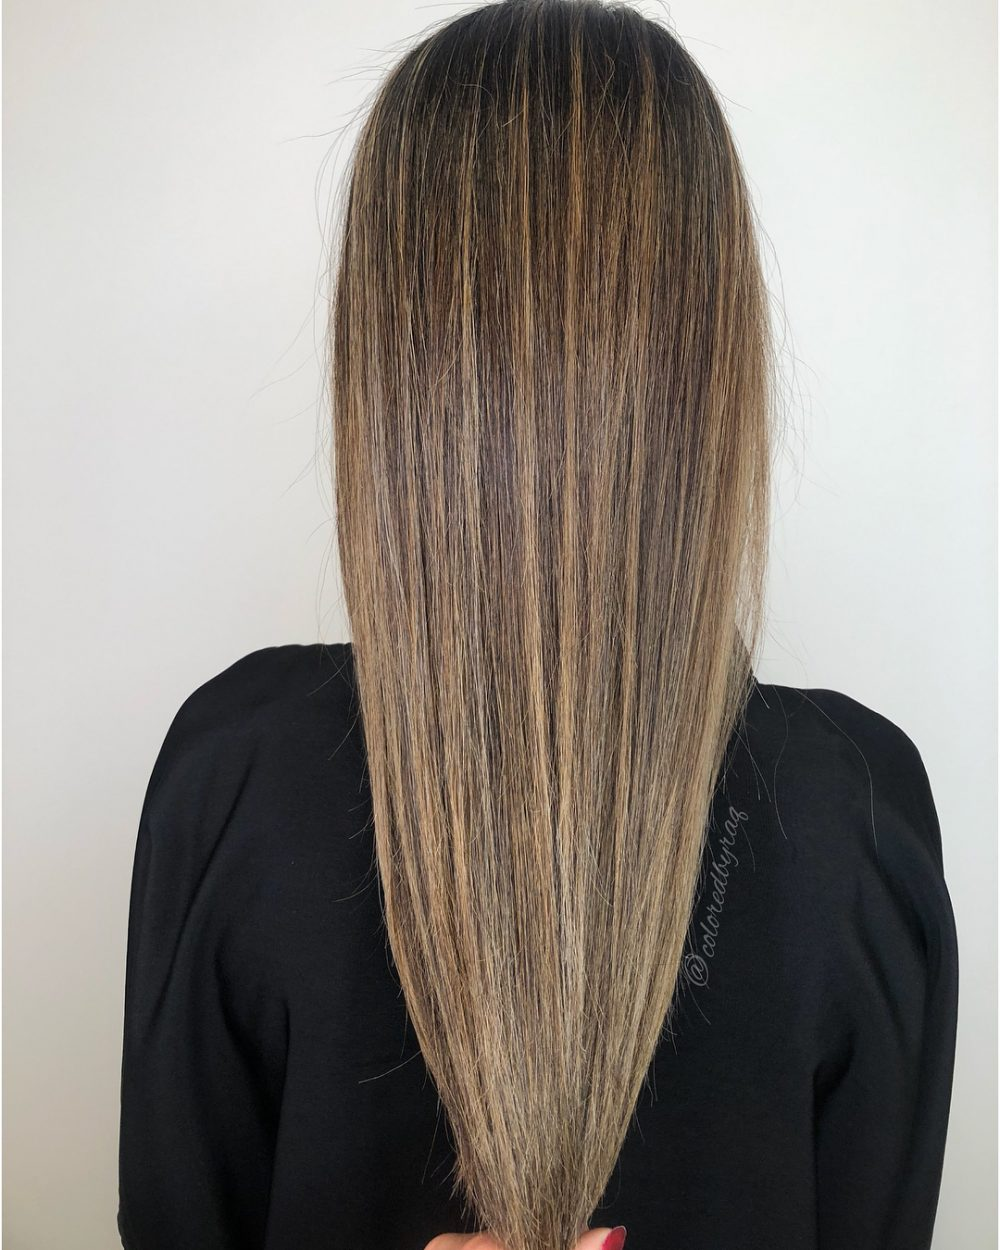 Multi-Technique Brunette hairstyle